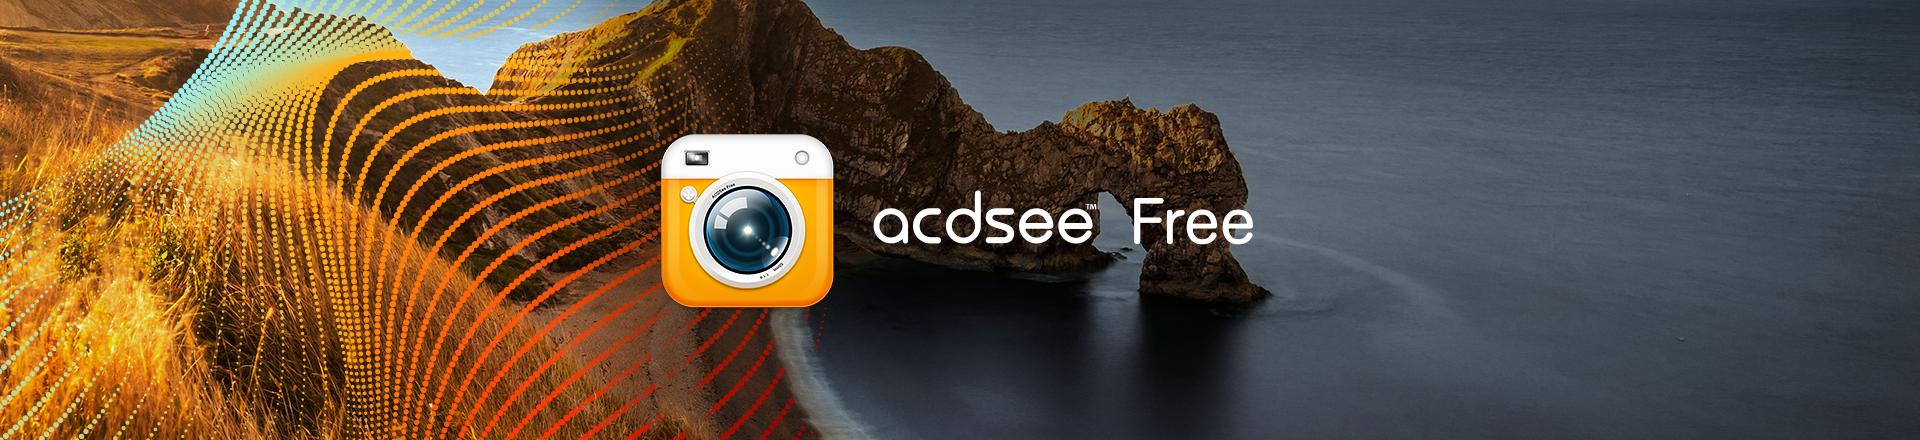 adobe reader 9.1 free download softonic